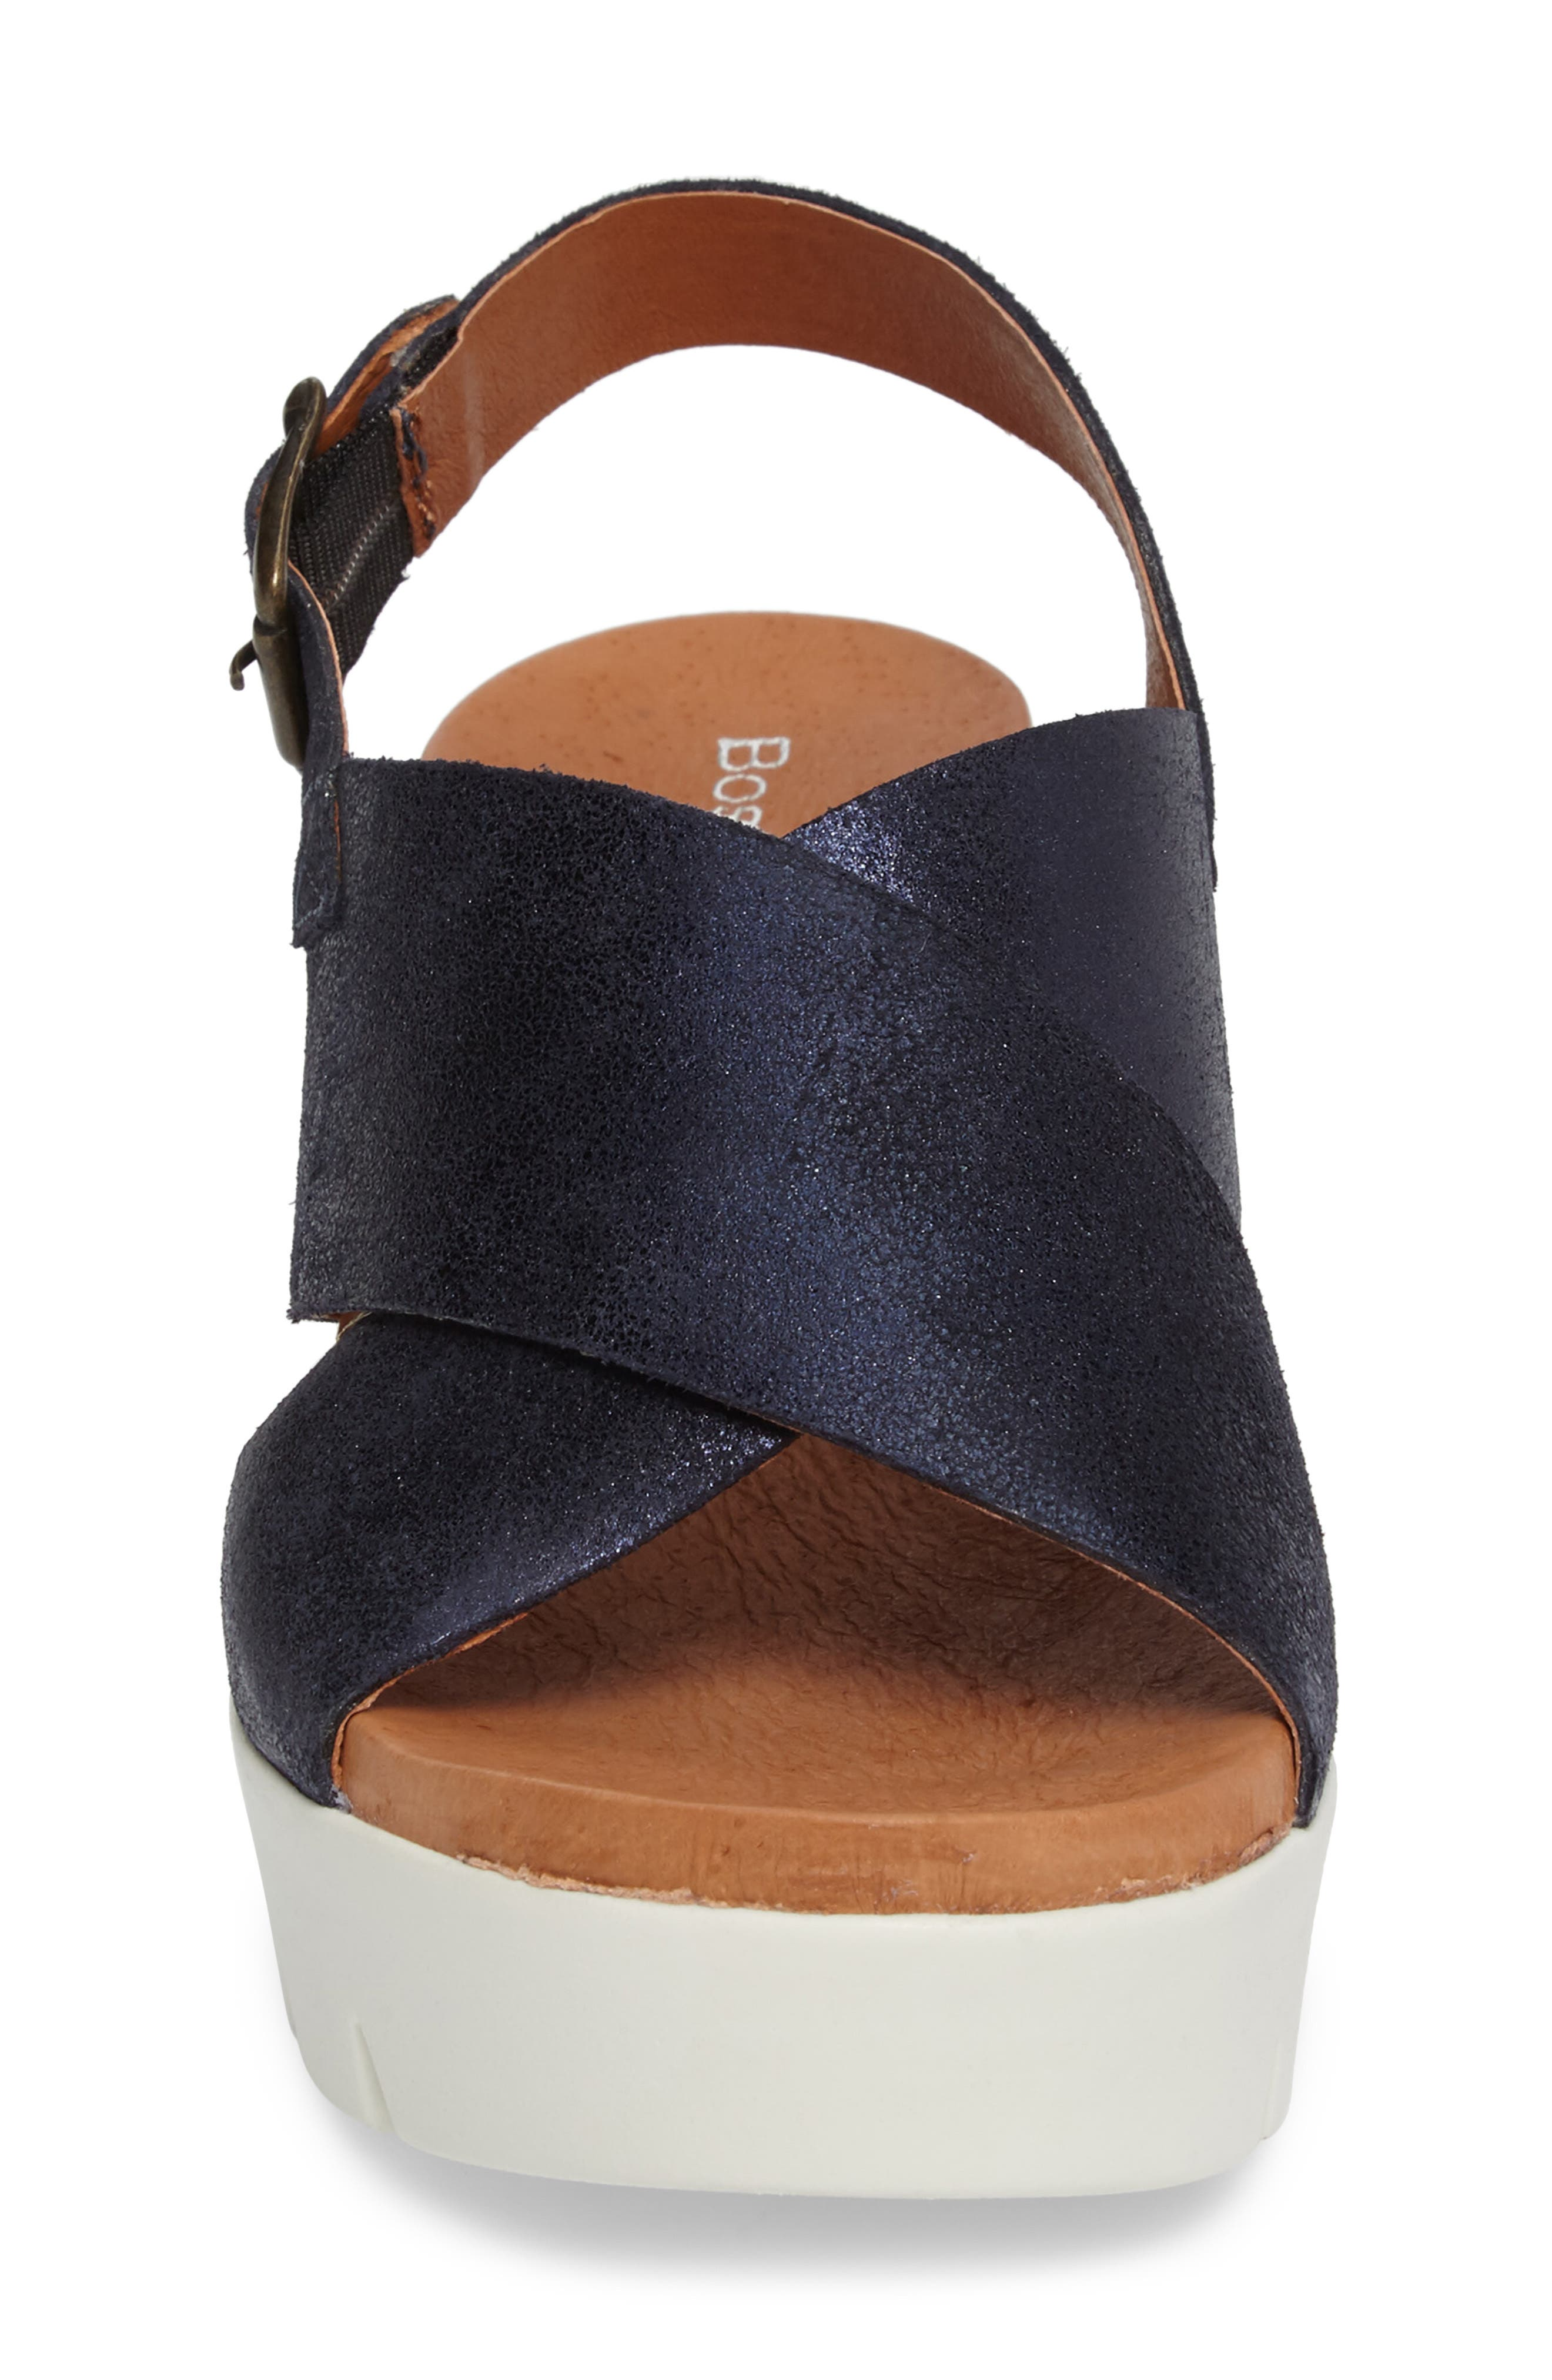 Payton Platform Wedge Sandal,                             Alternate thumbnail 4, color,                             Navy Glitter Suede